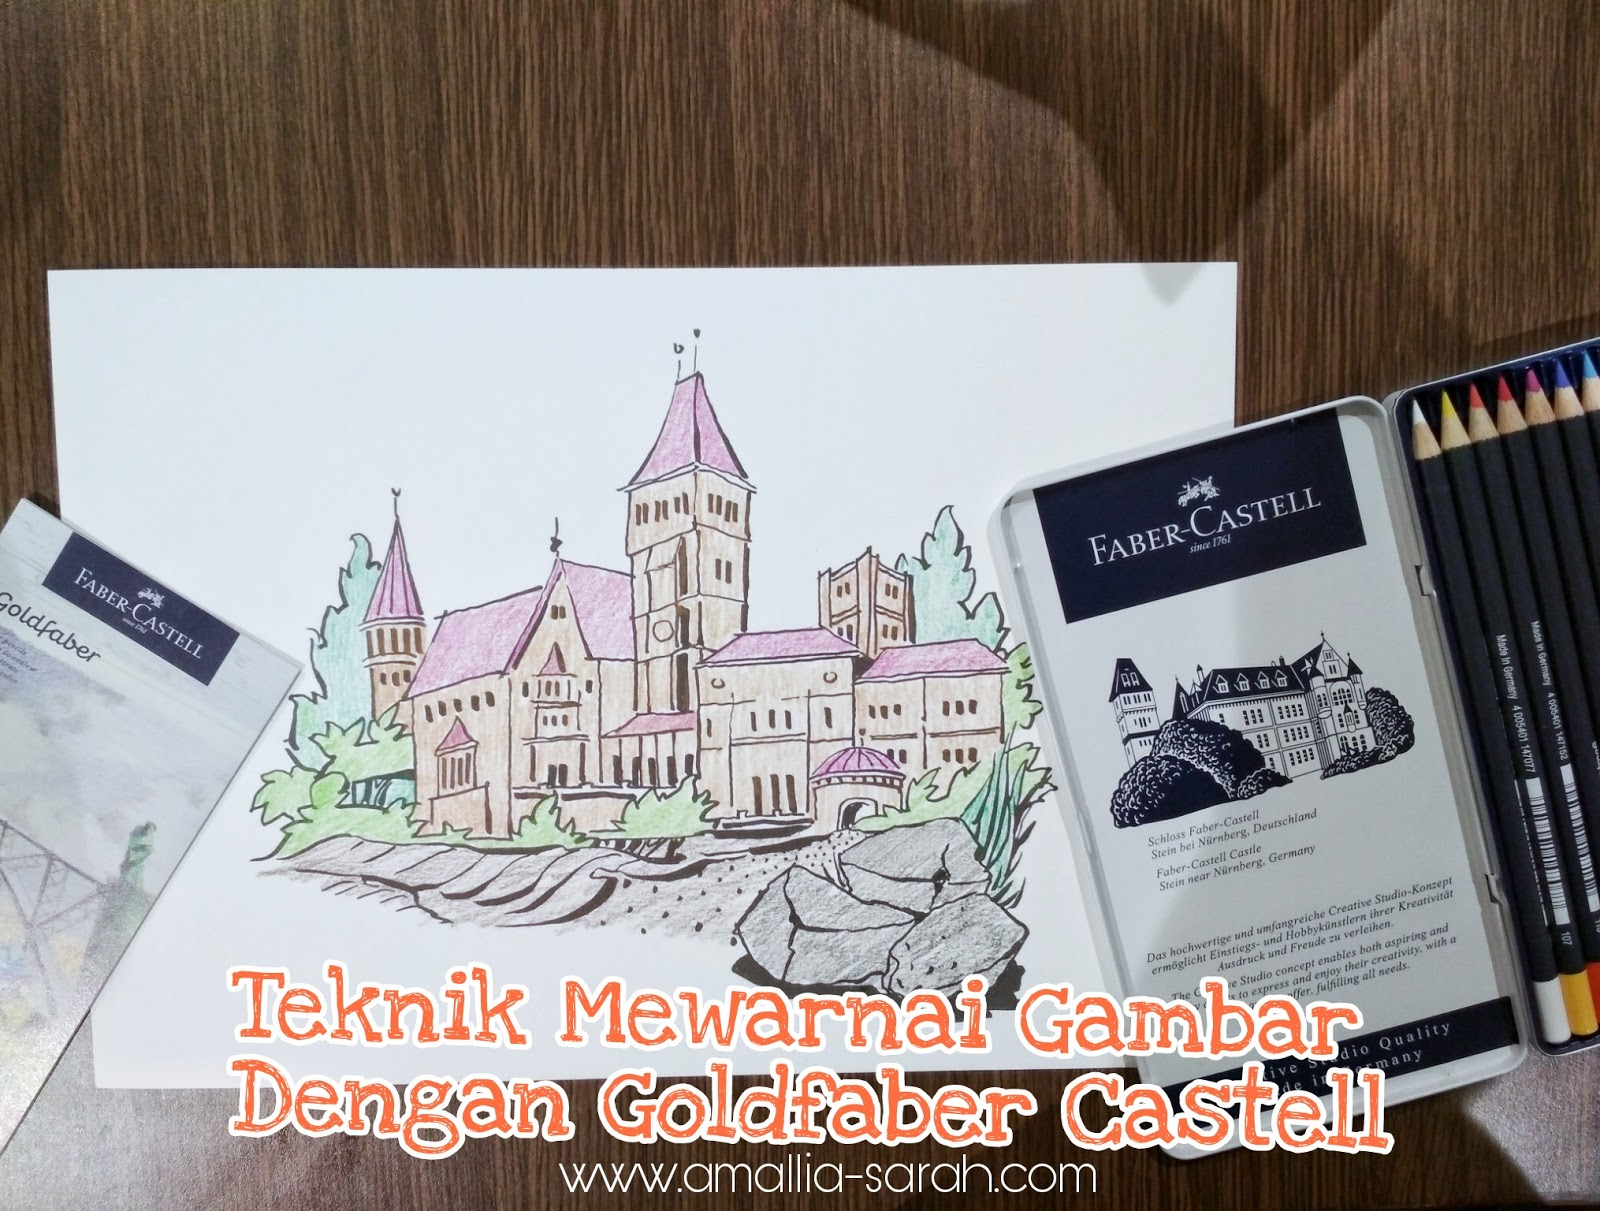 Teknik Mewarnai Gambar Dengan Goldfaber Castell